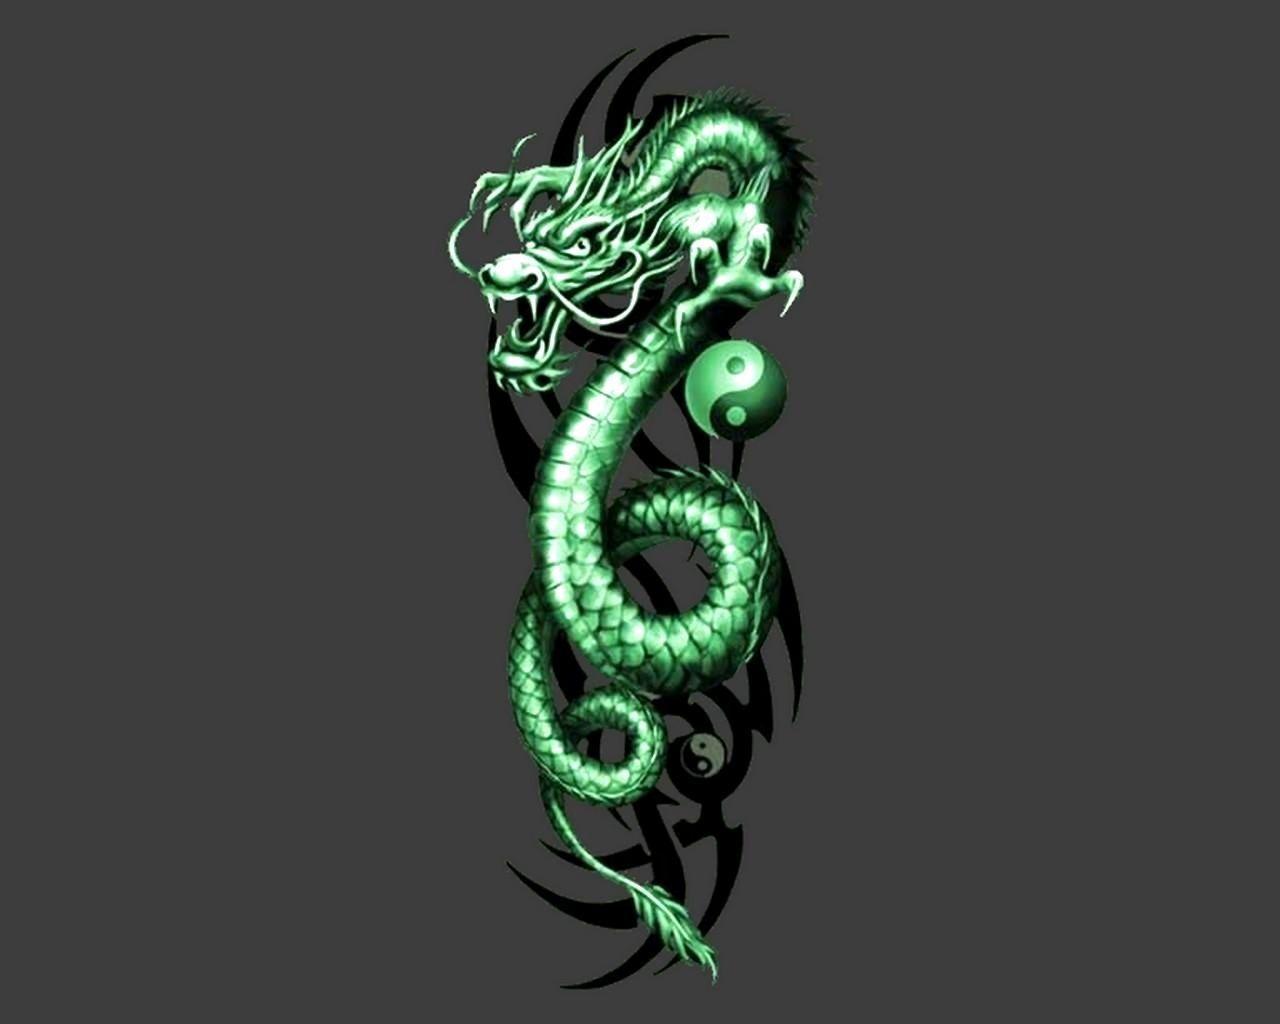 Neon Green Dragon Wallpapers Top Free Neon Green Dragon Backgrounds Wallpaperaccess